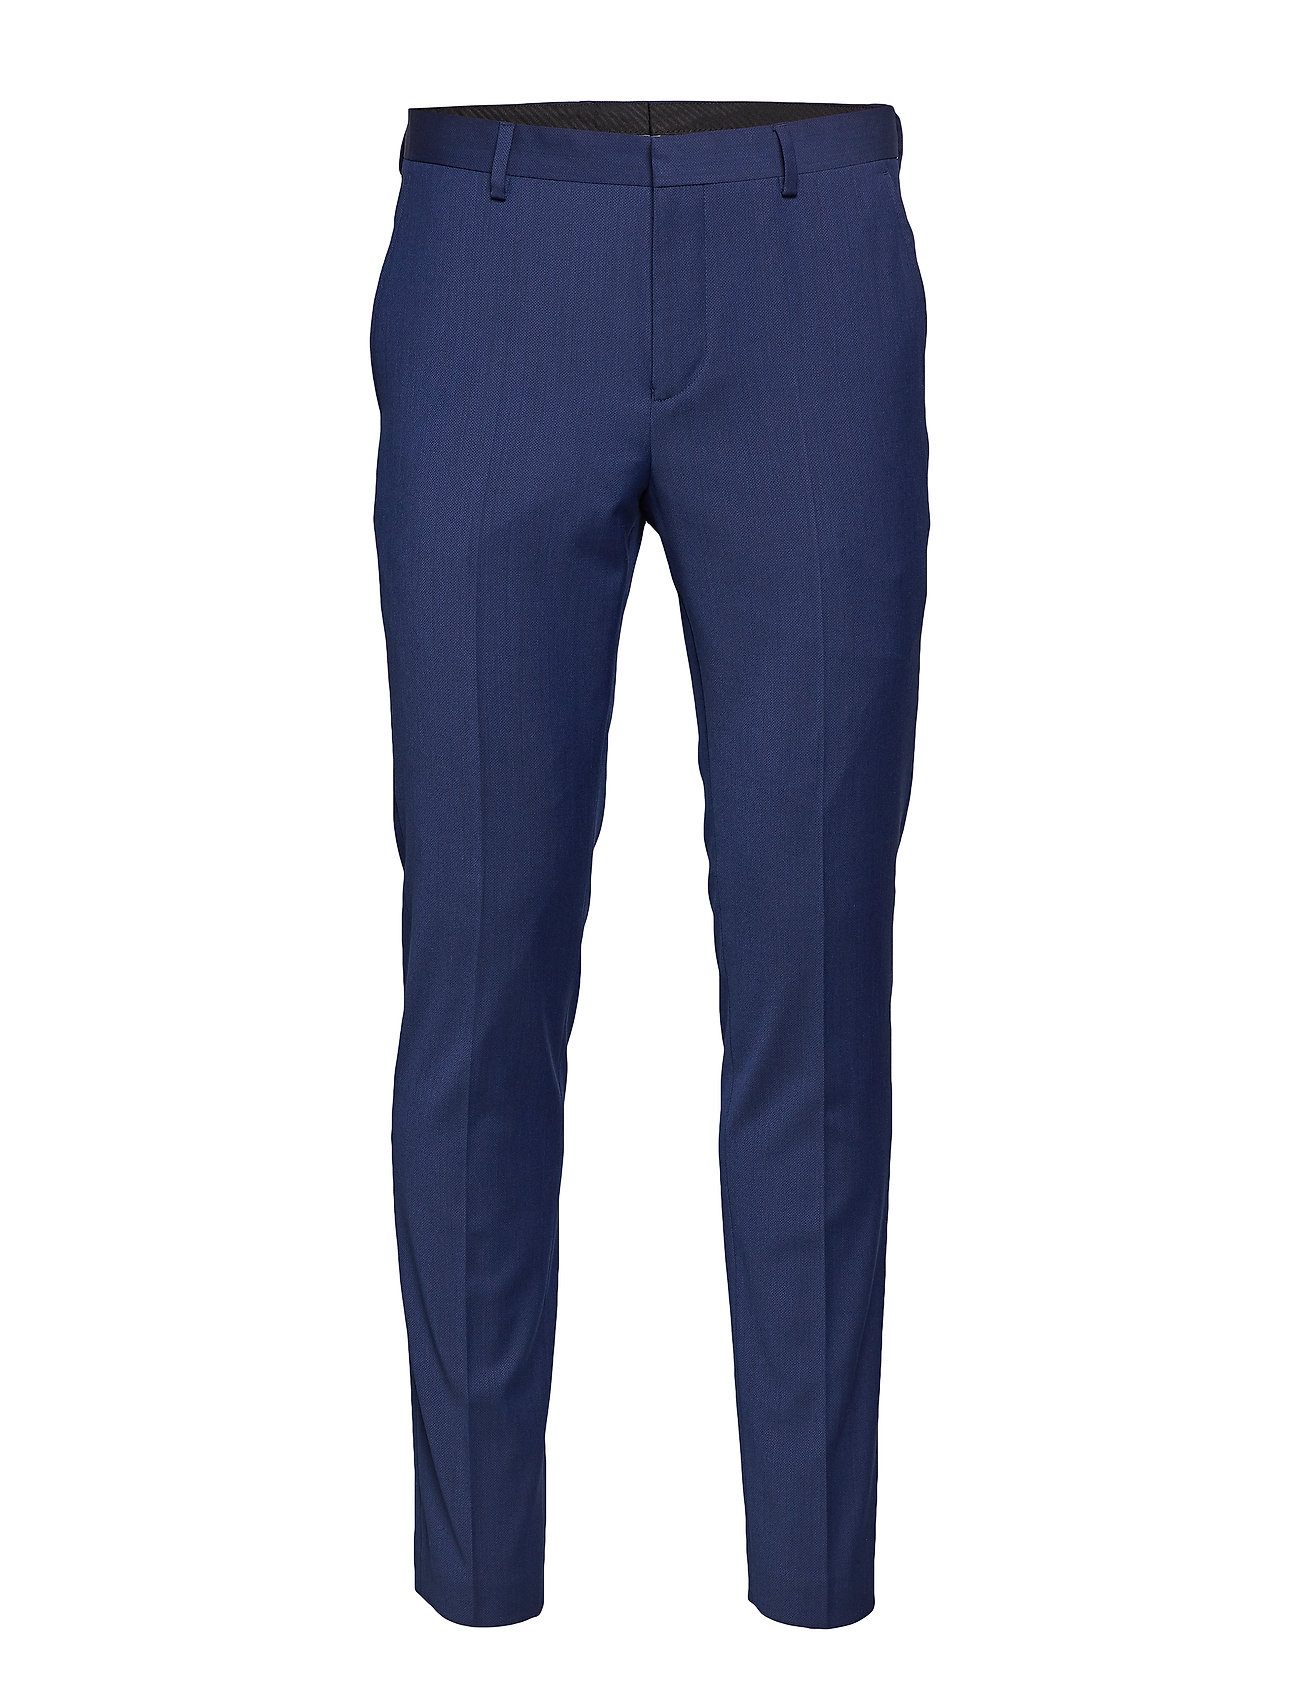 Slhslim-mylobill Blue Trs B Noos (Blue Depths) (£65) - Selected ... 4f4ed3d4d91